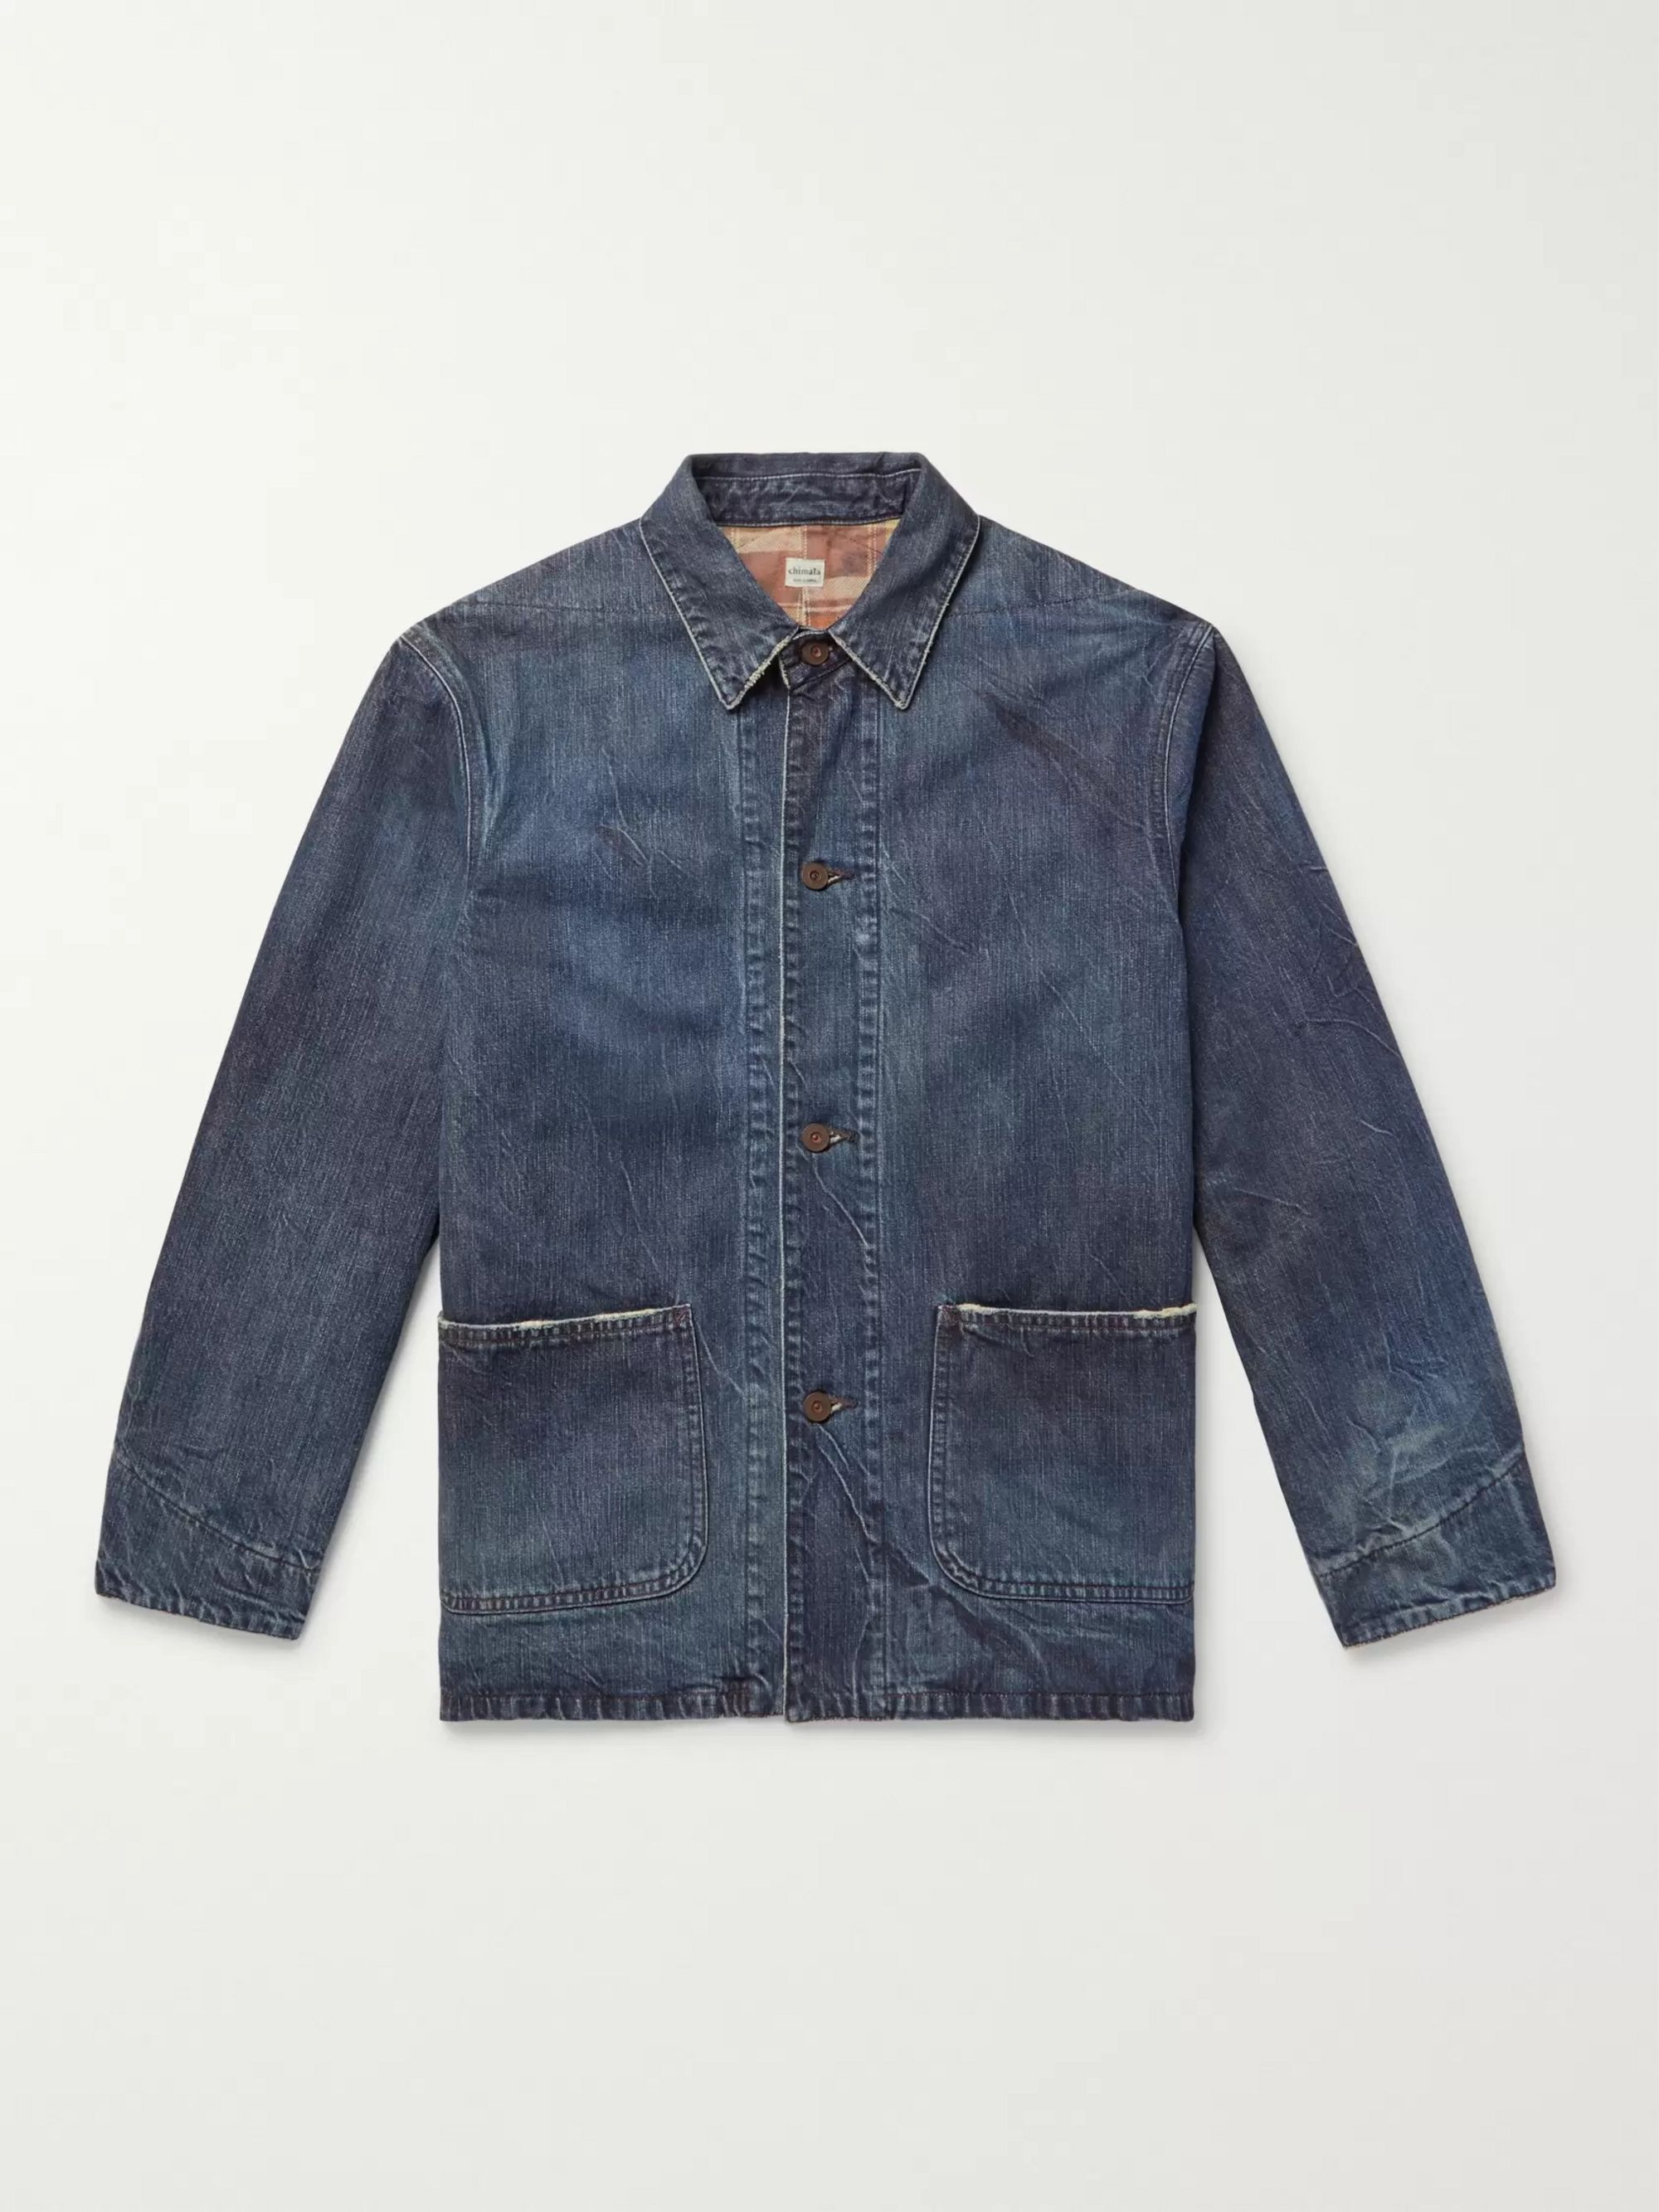 Blue J.CREW Denim Coats & Jackets for Men for Sale | Shop